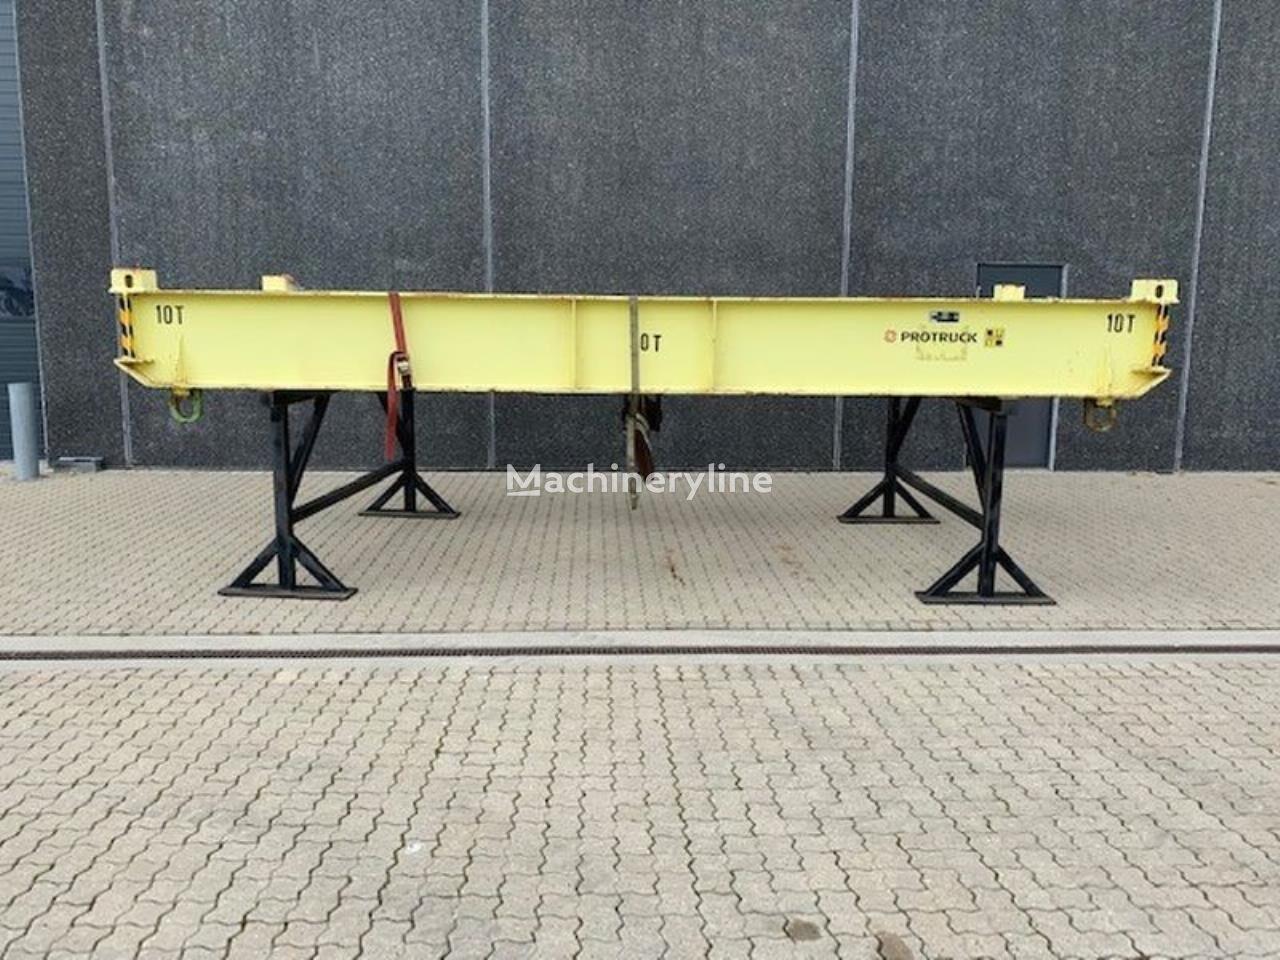 new SMV Konecranes UNIKTRUCK LF20-45RS reach stacker